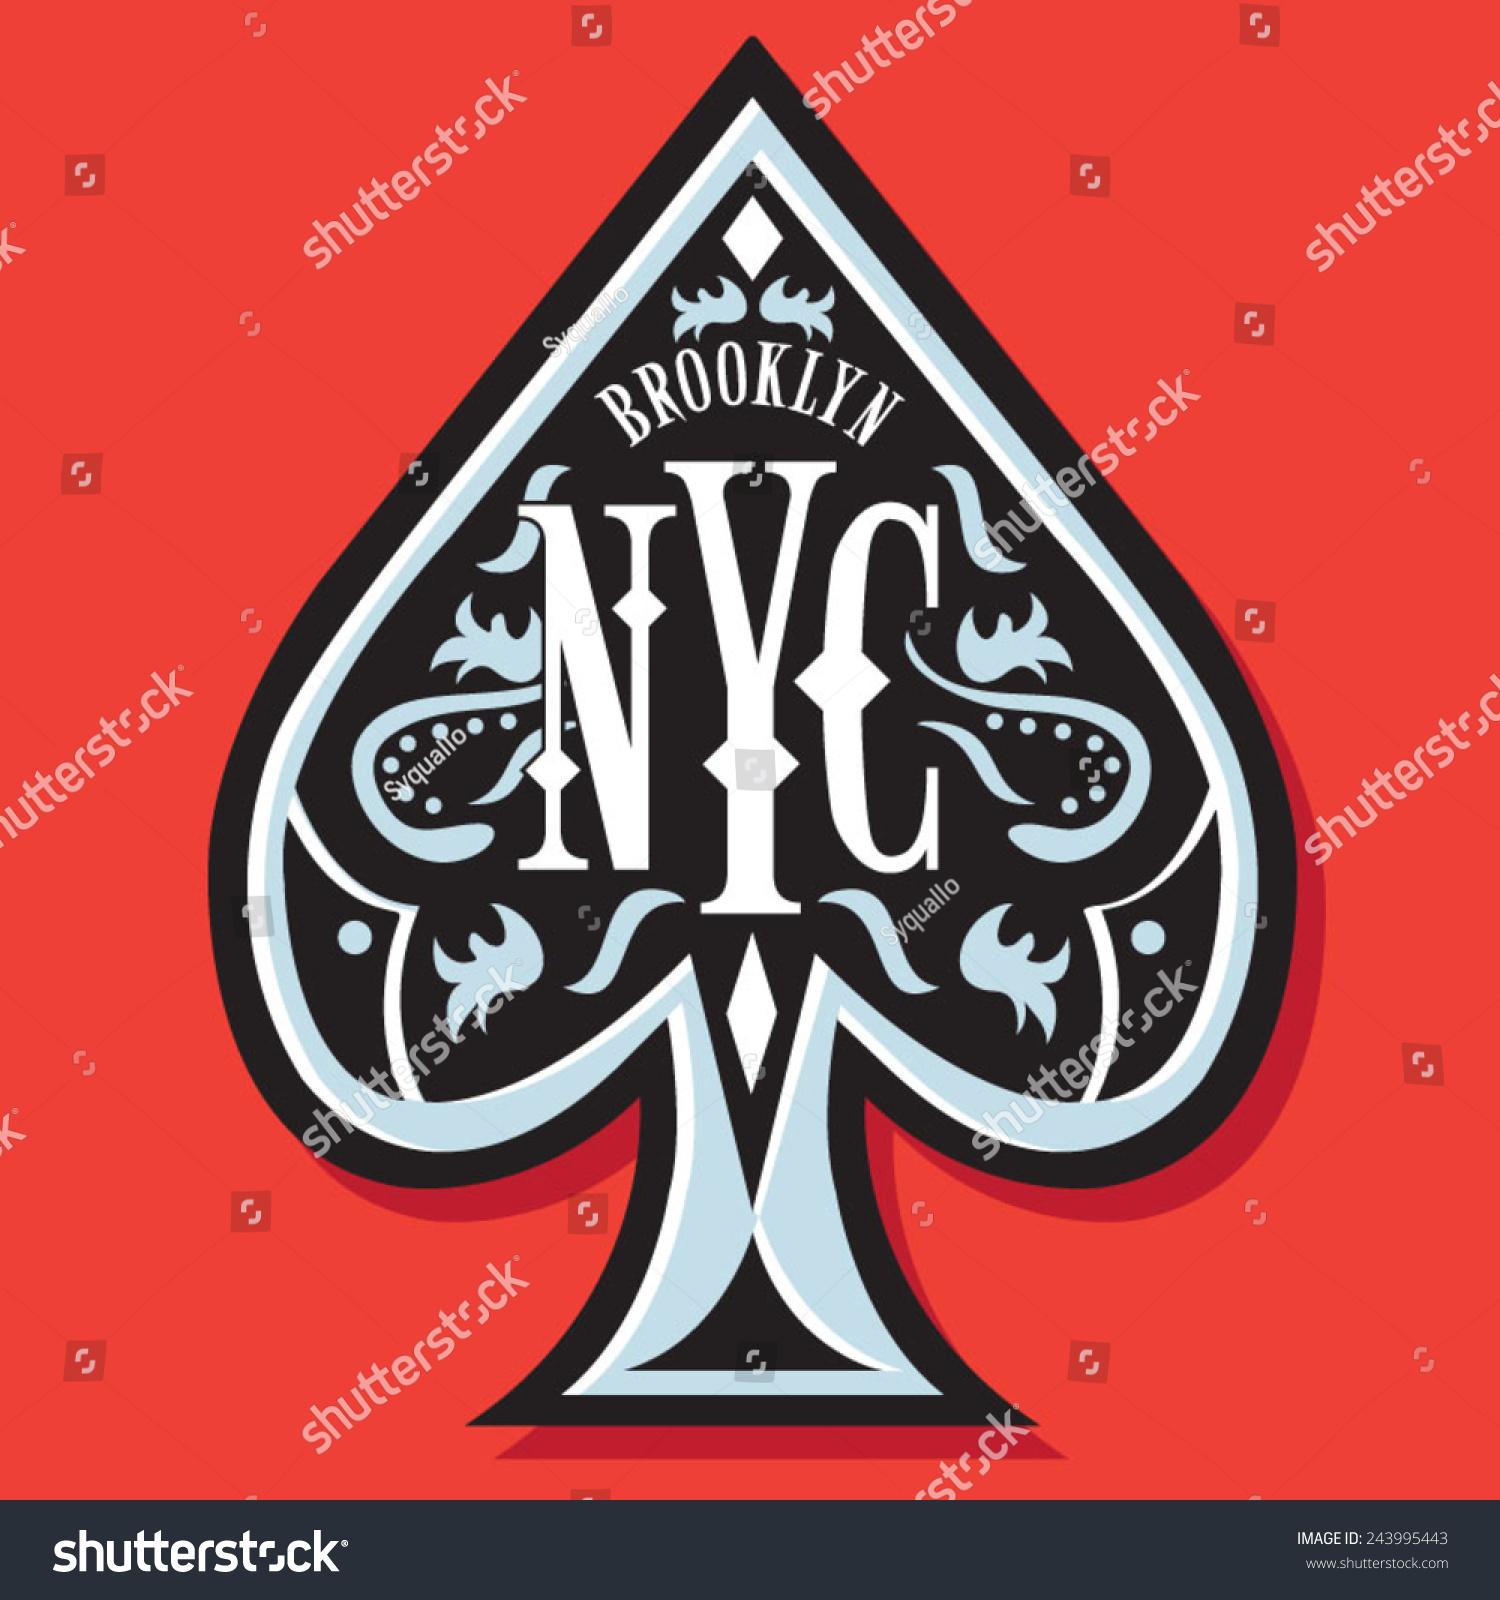 Free poker games nyc